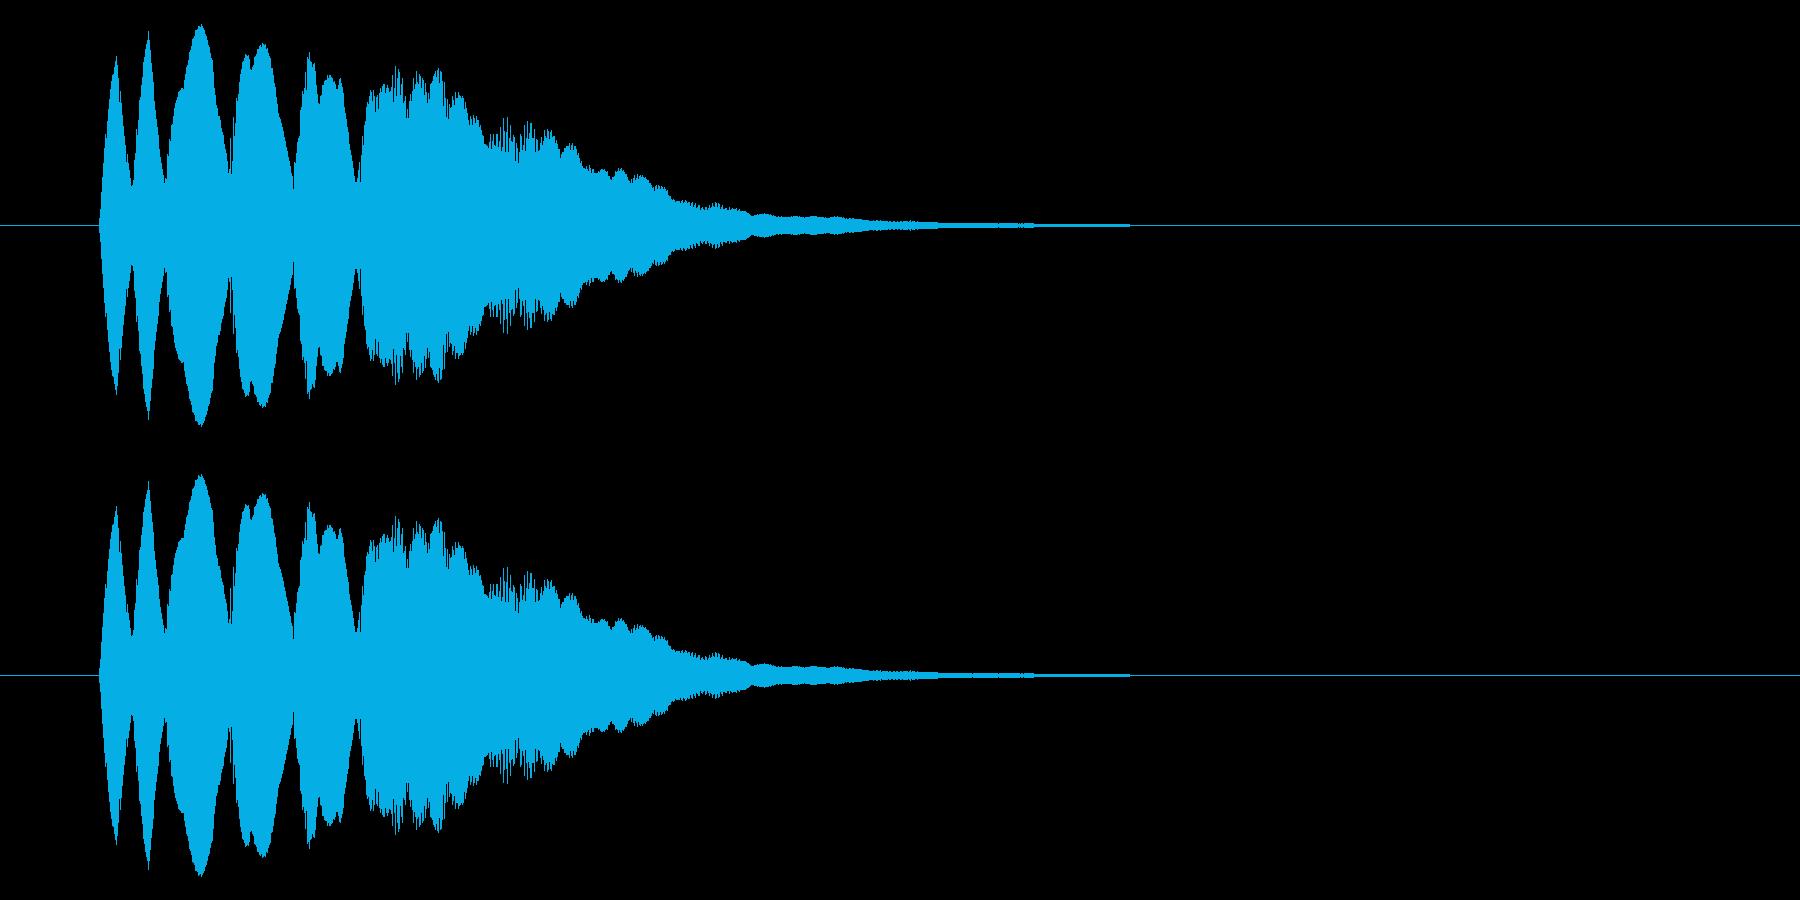 SNES-RPG04-13(魔法 回復)の再生済みの波形